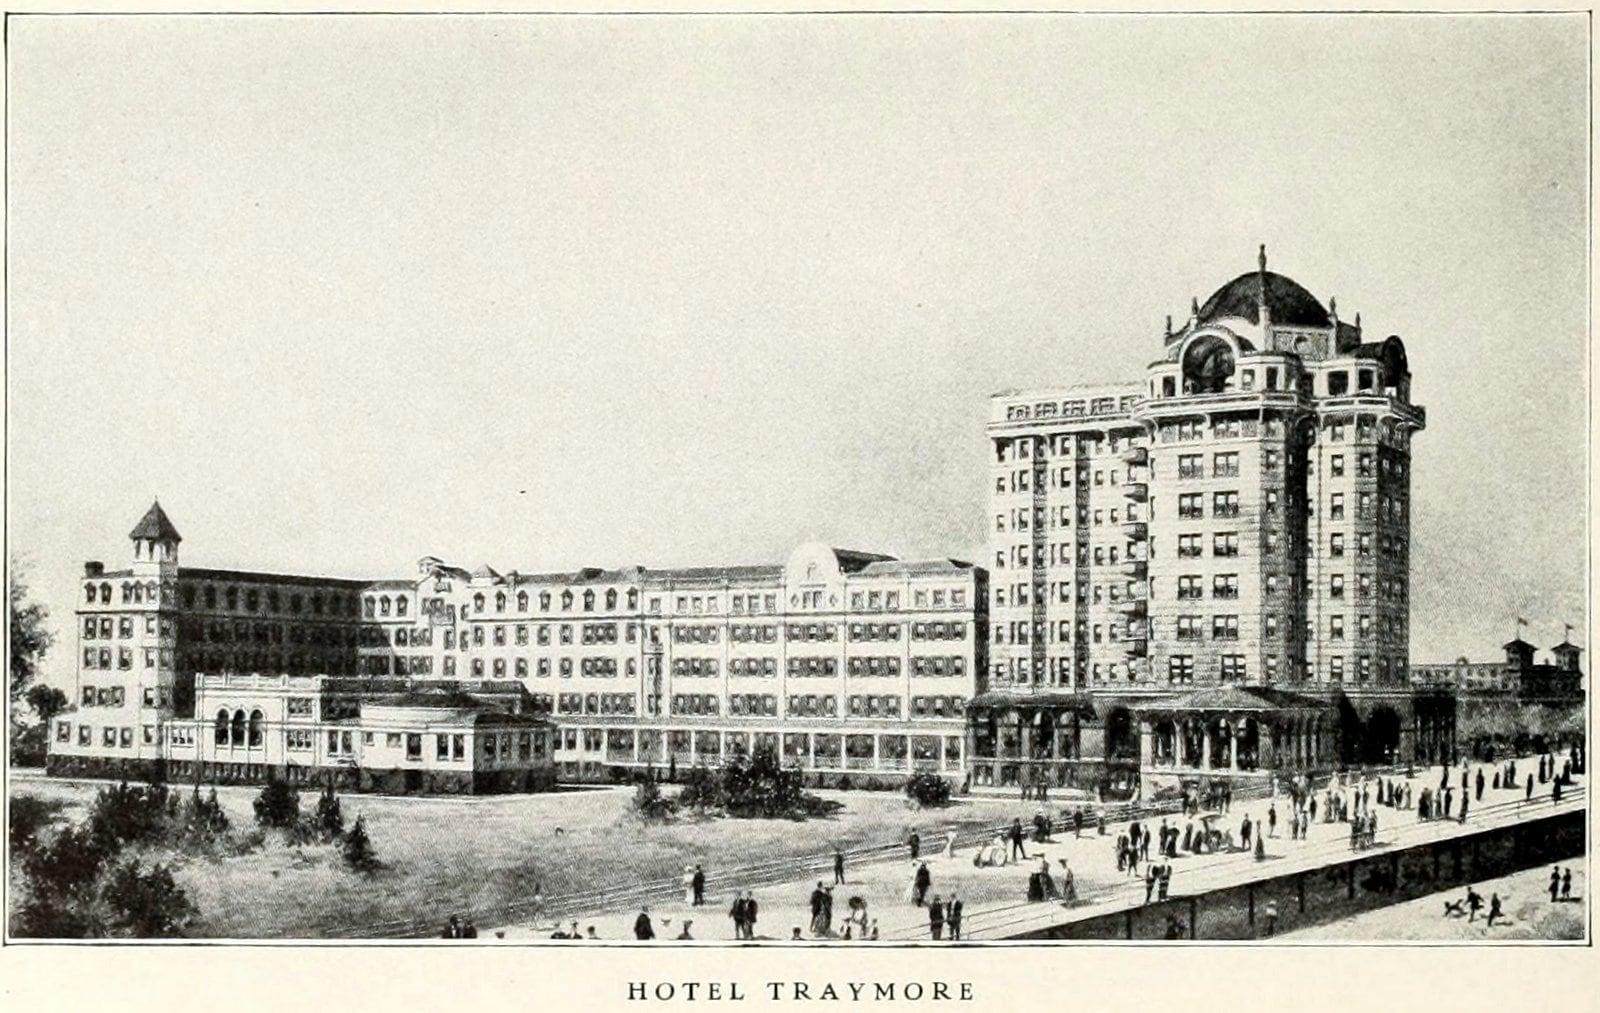 Hotel Traymore - Old Atlantic City (1911)